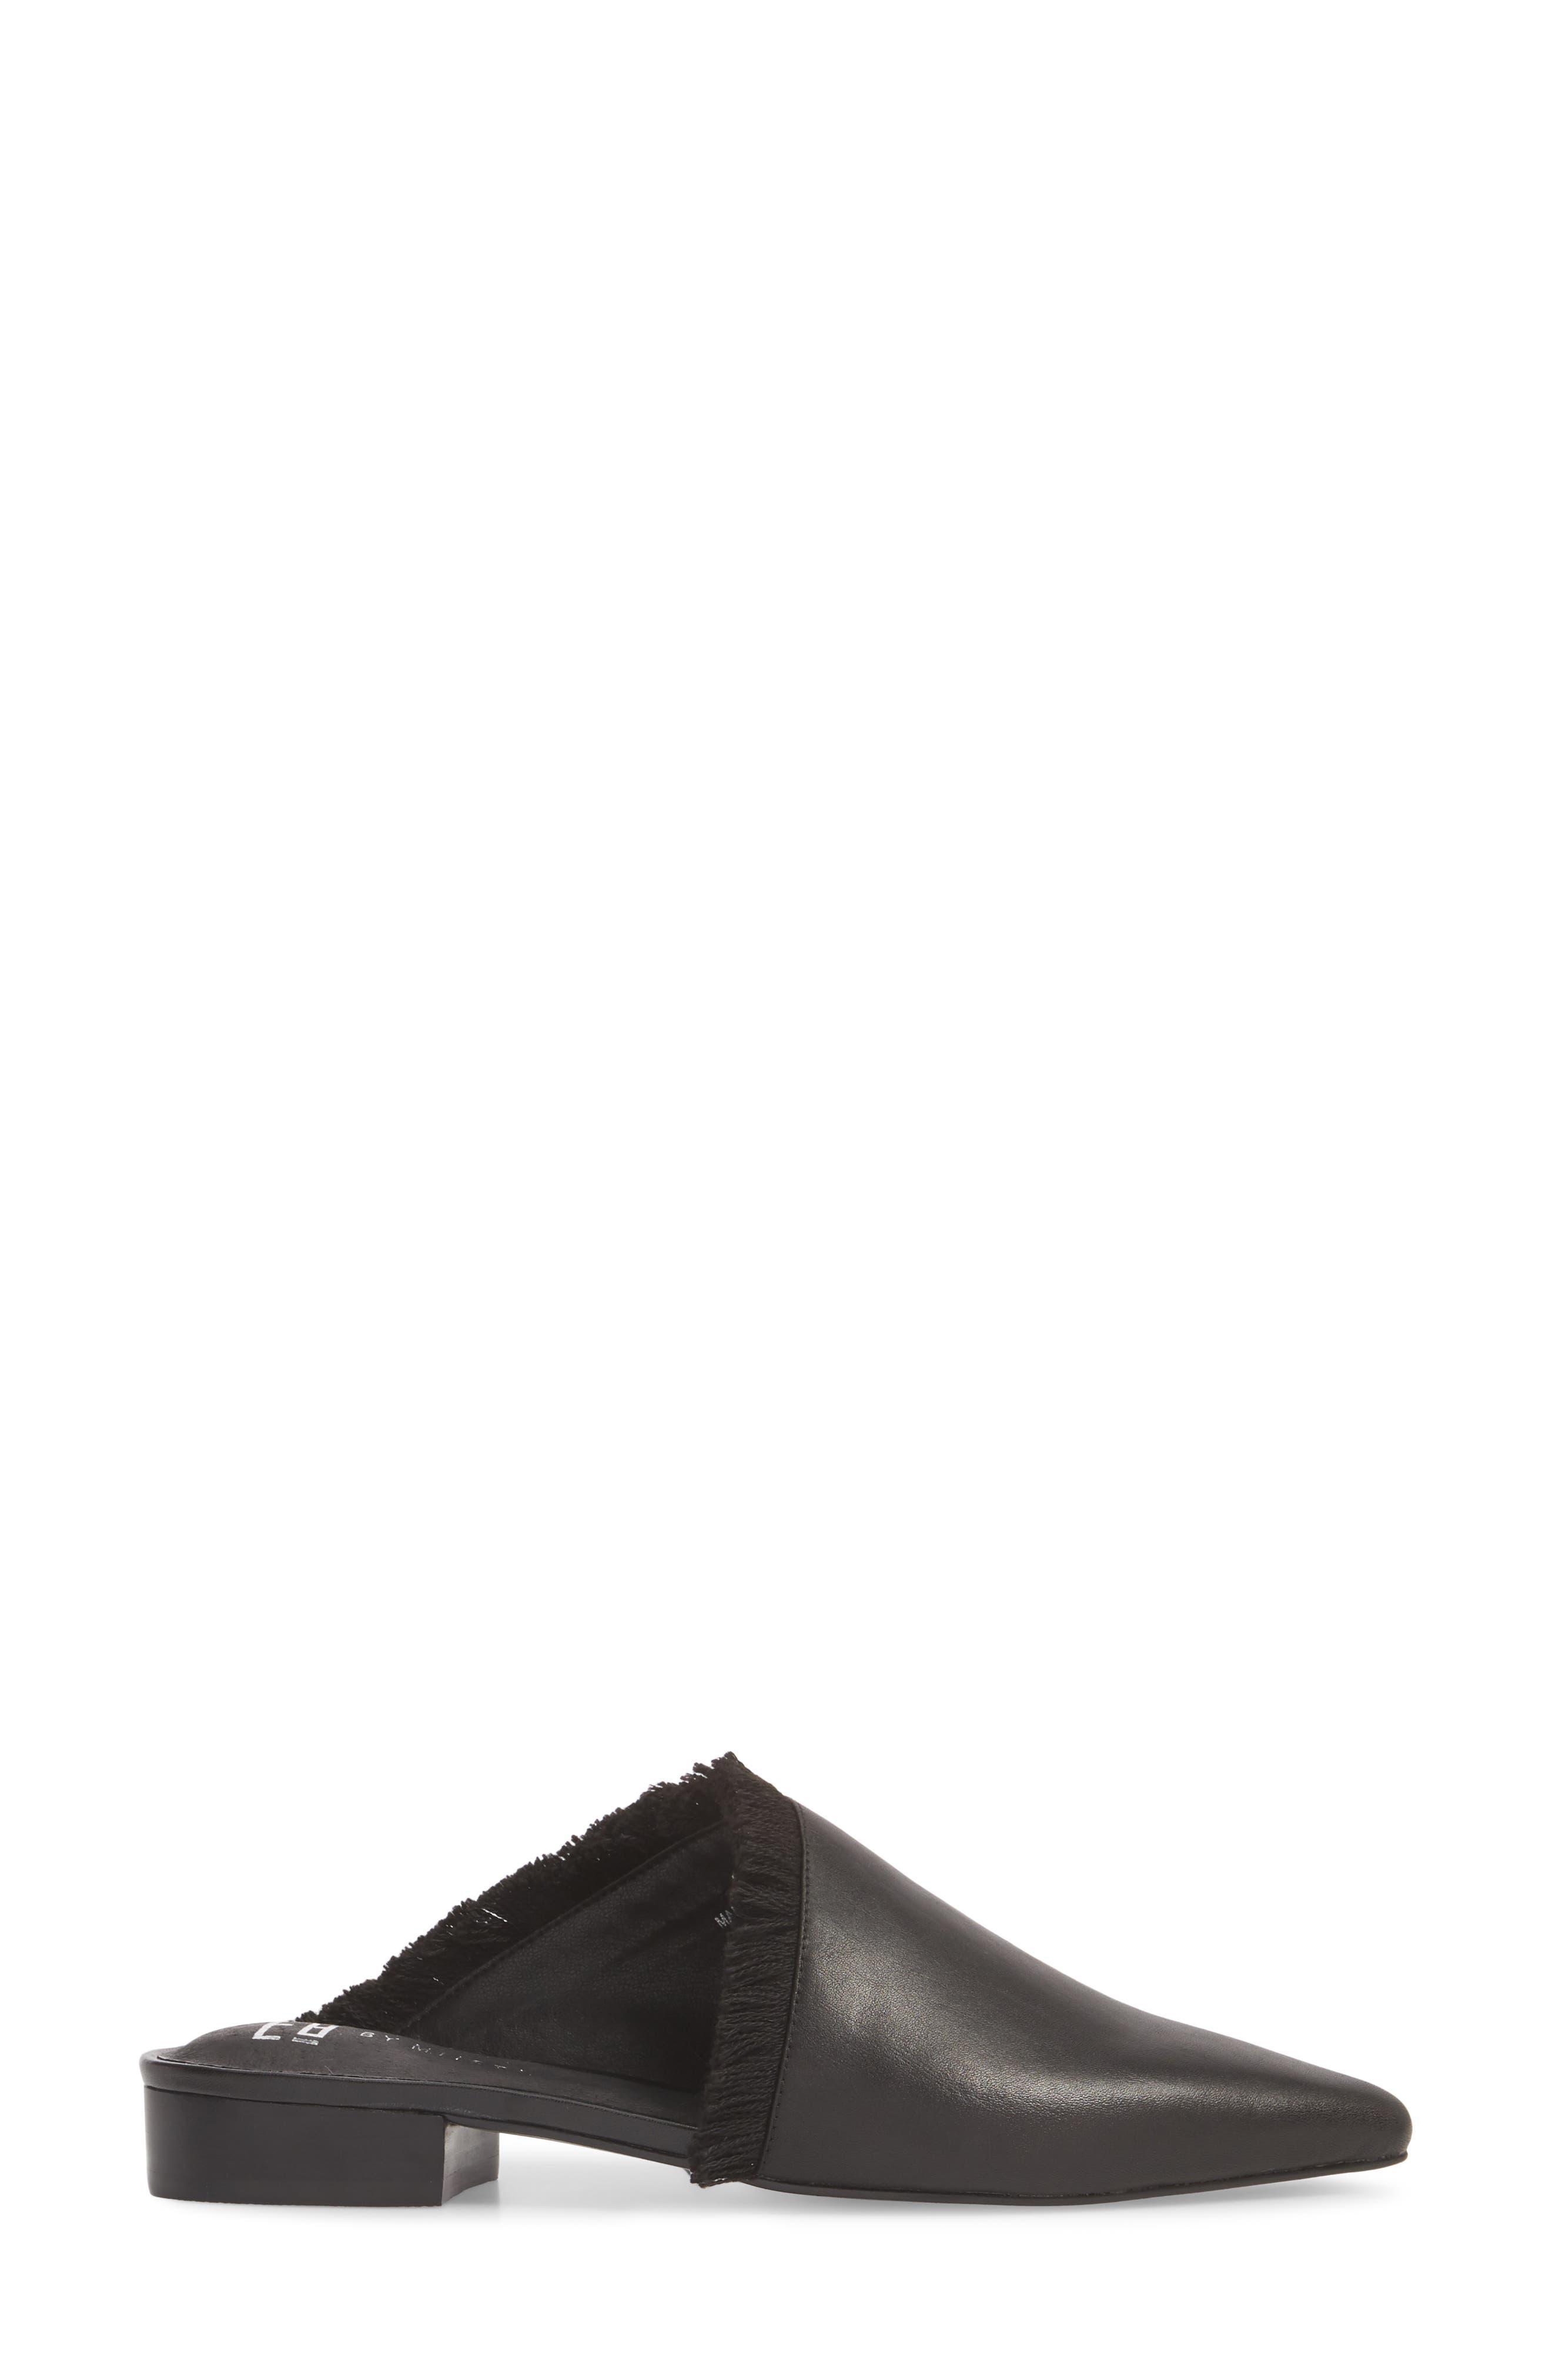 Leroy Asymmetrical Flat Mule,                             Alternate thumbnail 3, color,                             Black Leather